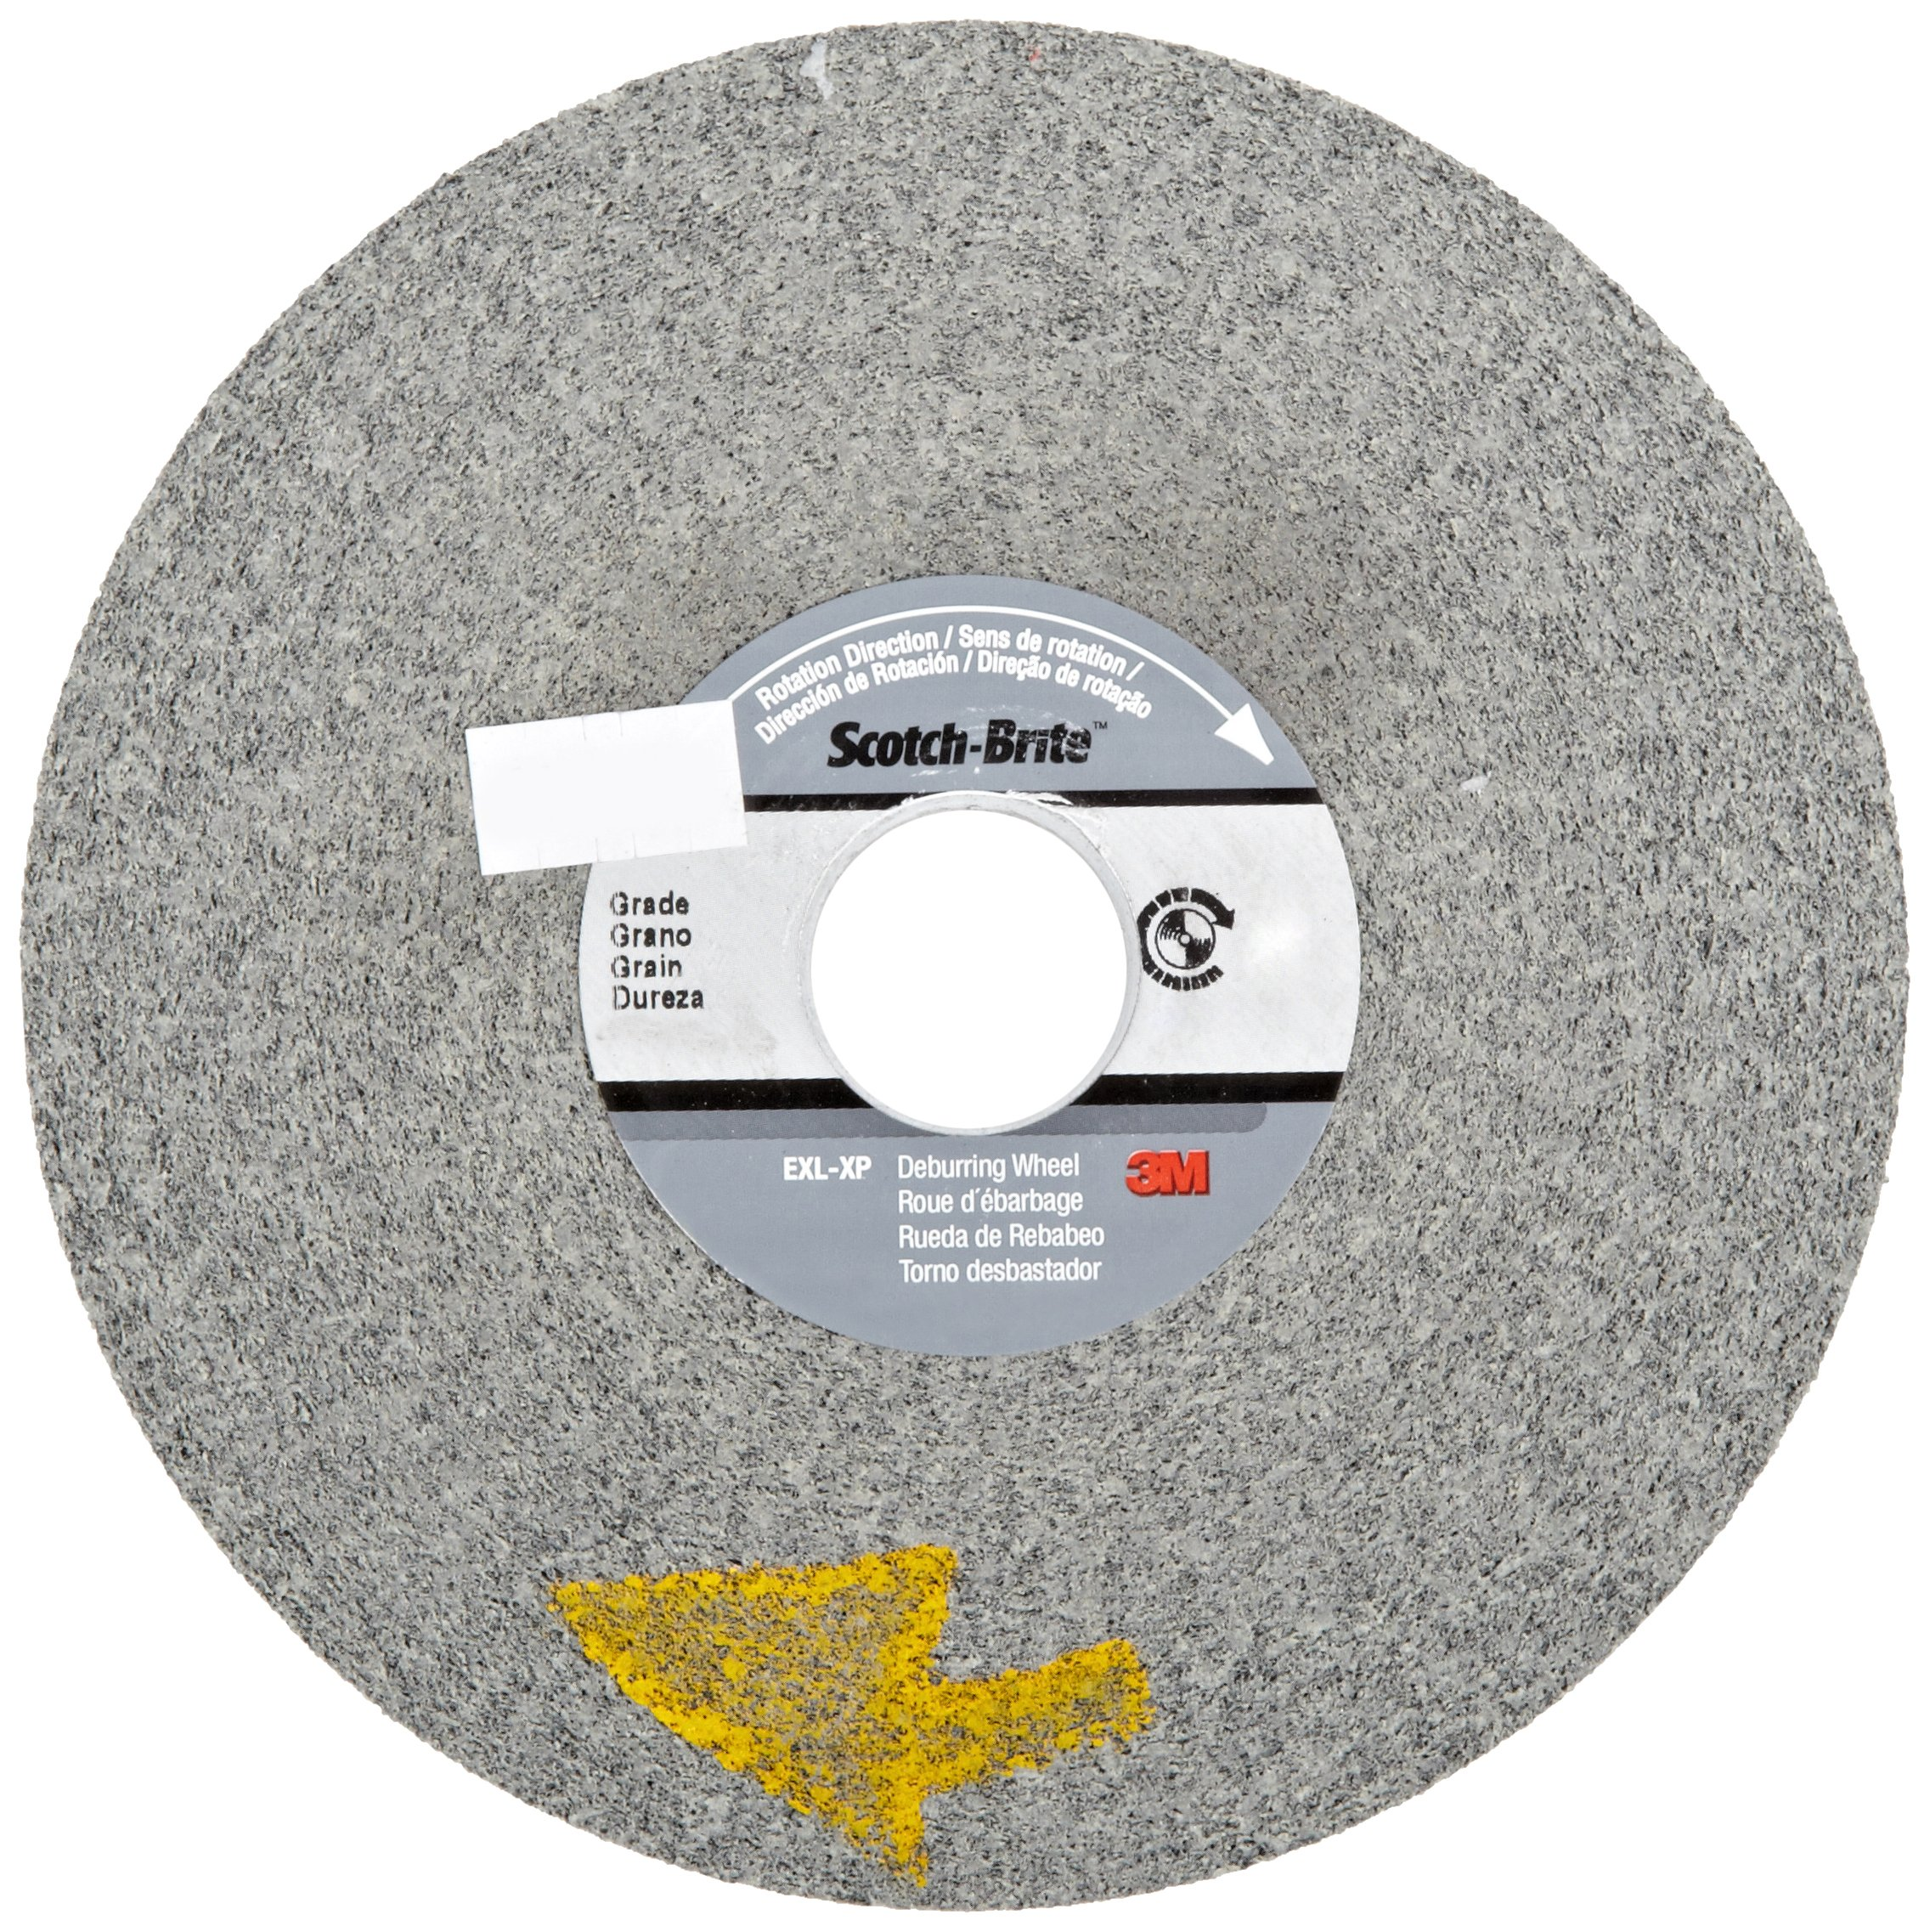 Scotch-Brite(TM) EXL-XP Deburring Wheel, Silicon Carbide, 6000 rpm, 6 Diameter, 1 Arbor, 11S Fine Grit  (Pack of 3)